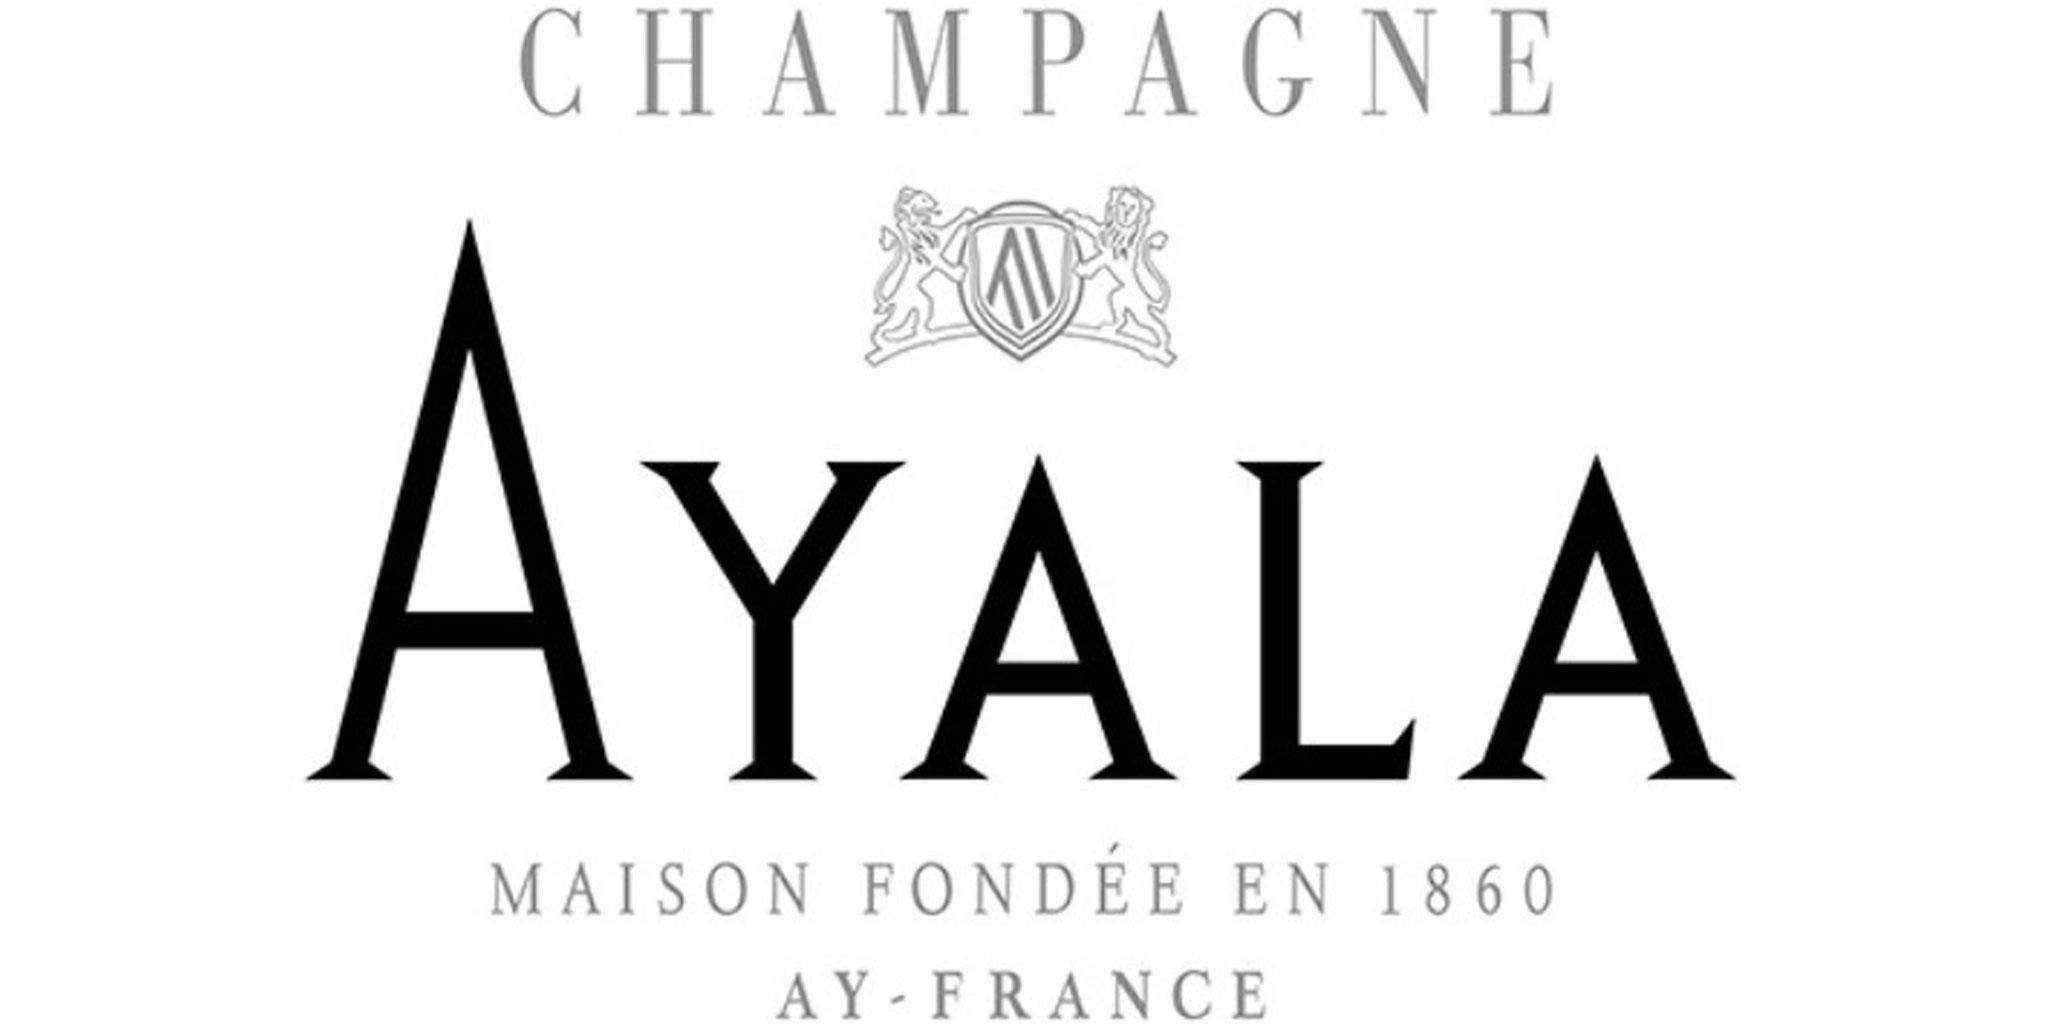 Ayala champagne logo